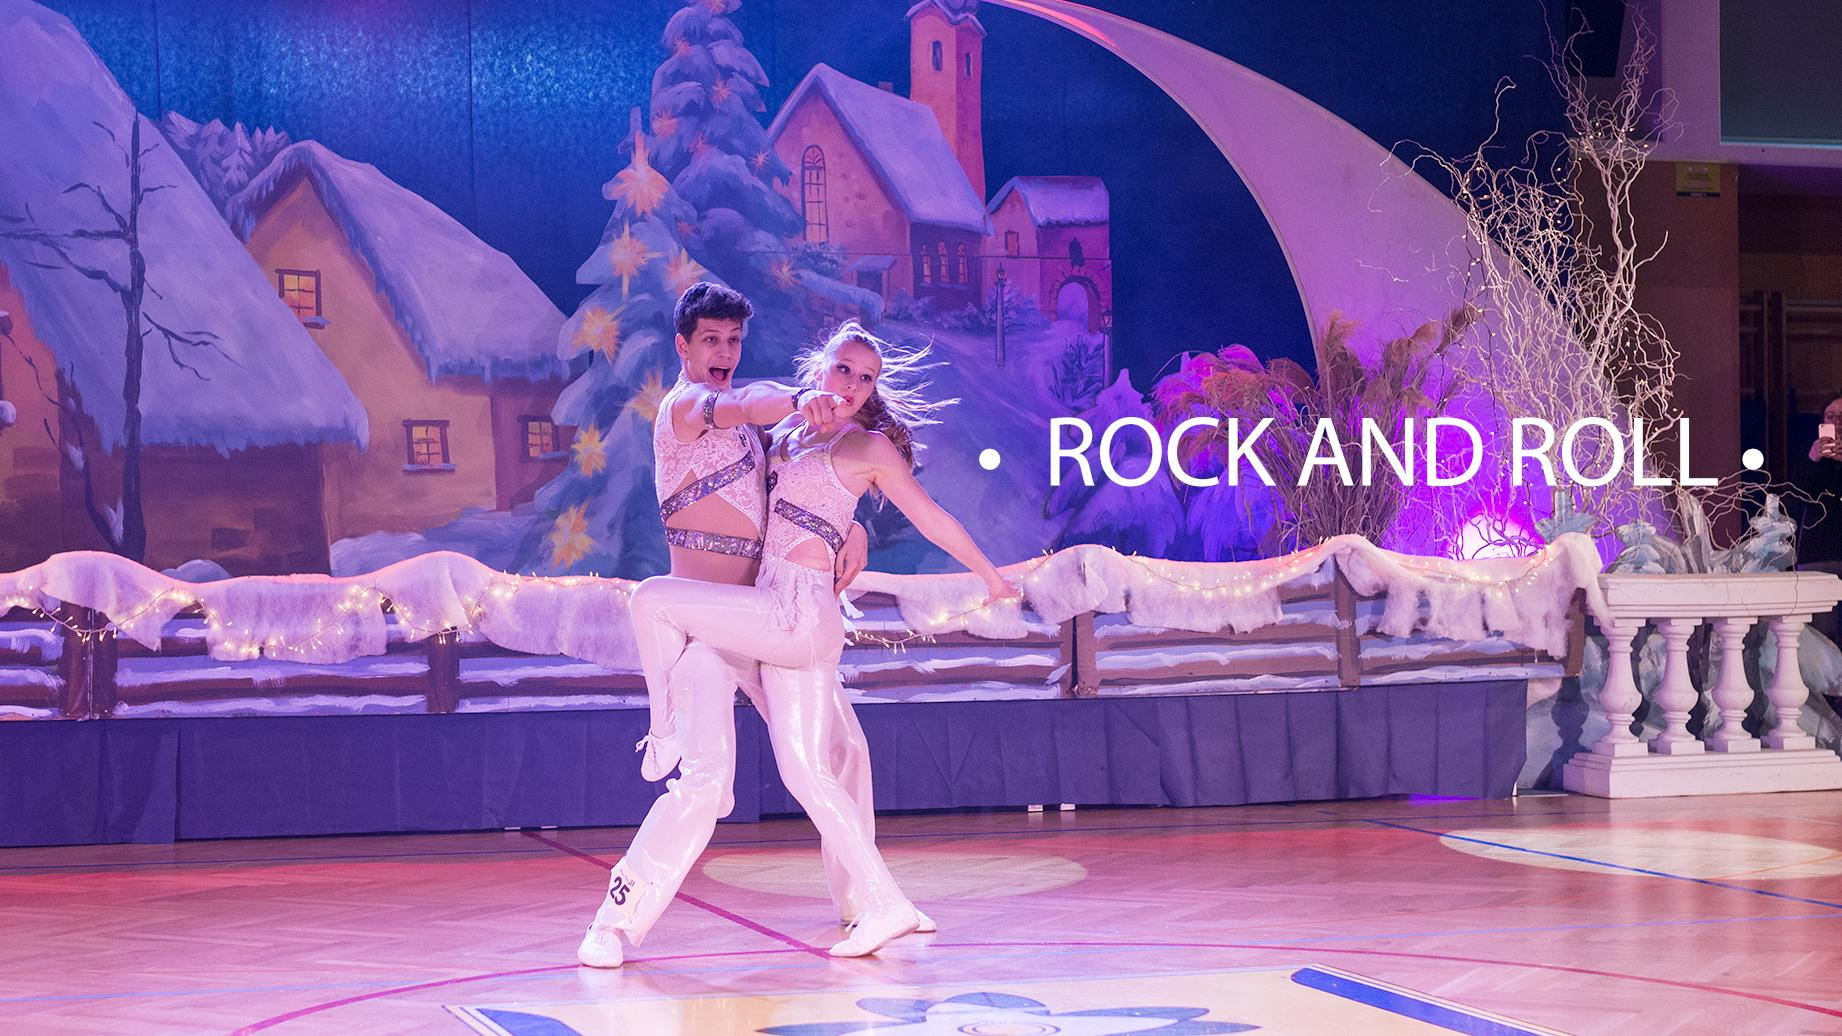 Rock and Roll plesni par na tekmovanju, Rock and Roll